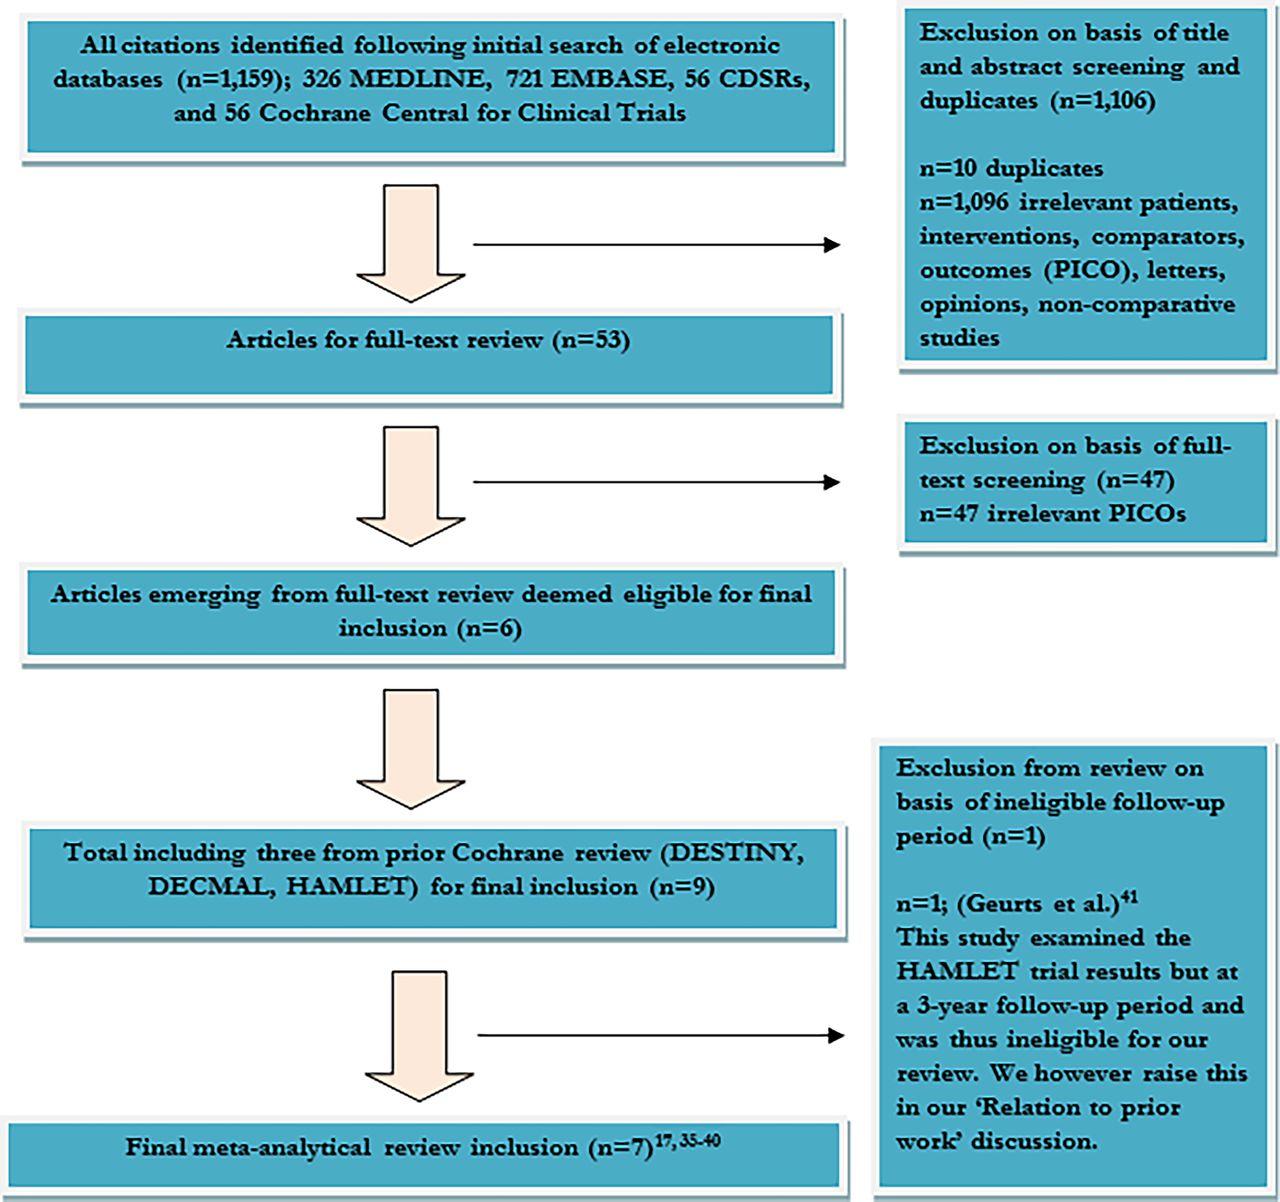 Hemicraniectomy versus medical treatment with large MCA